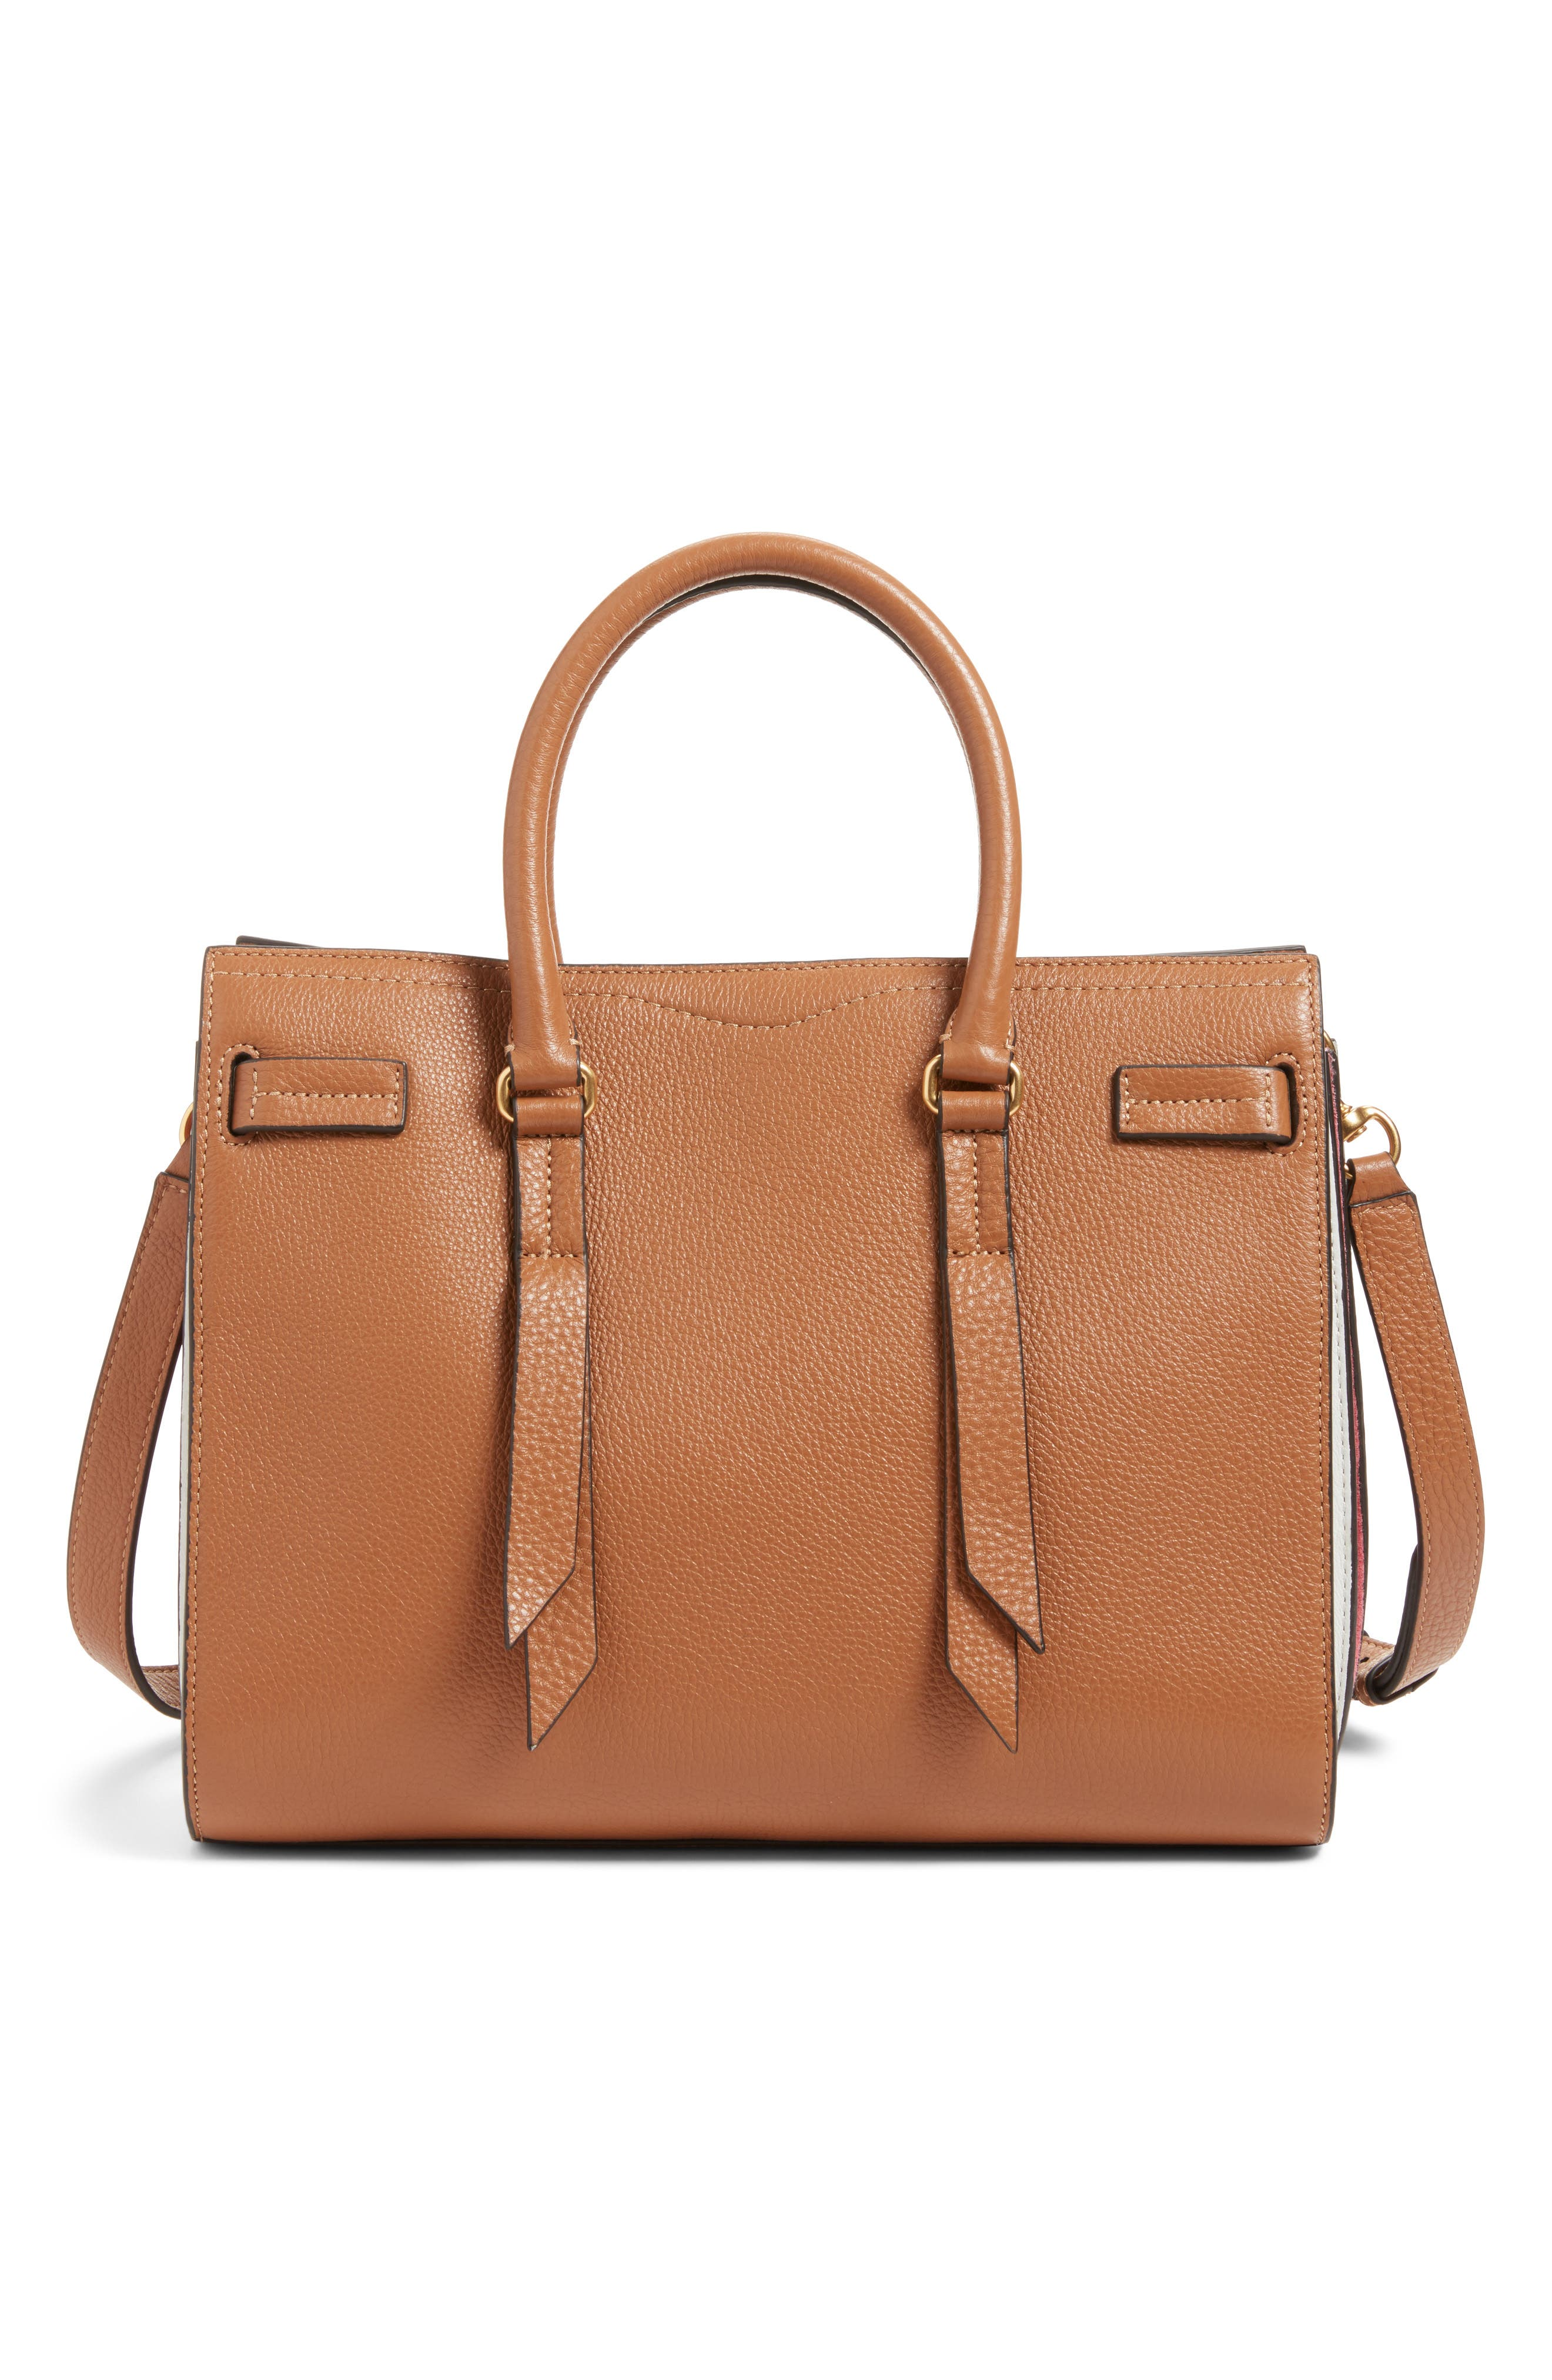 Sherry Calfskin Leather Satchel,                             Main thumbnail 1, color,                             Almond Multi